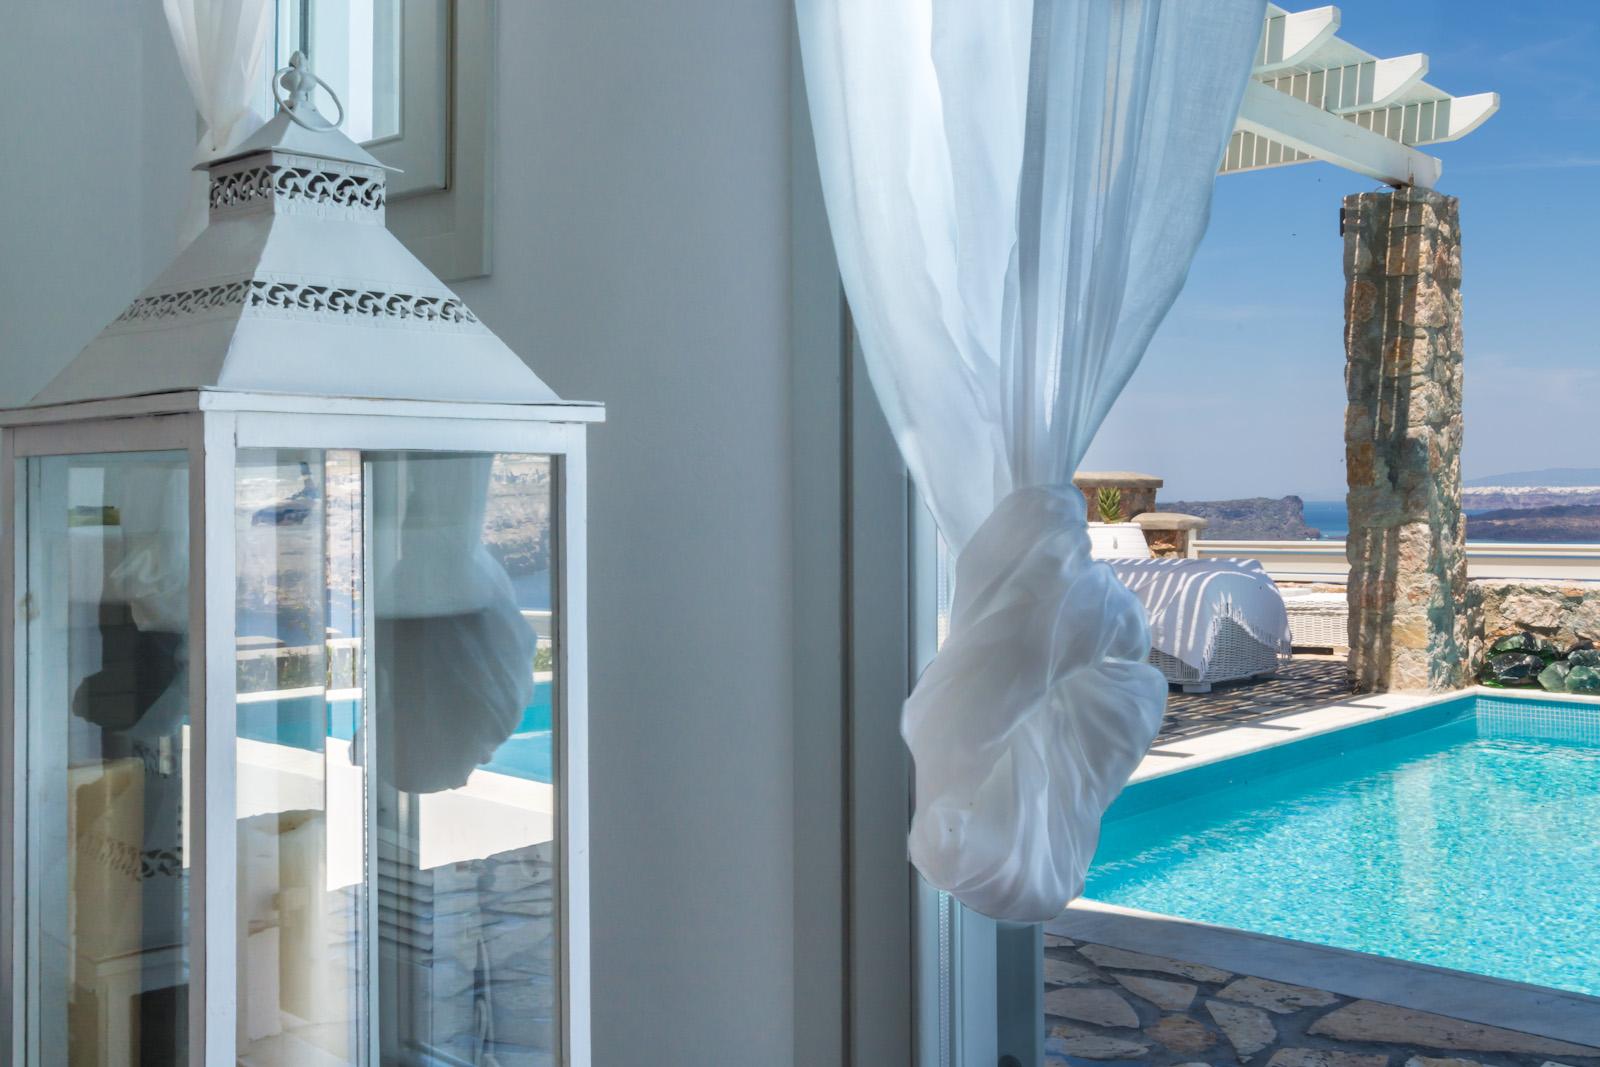 santorini villas 5 bedrooms luxury villas